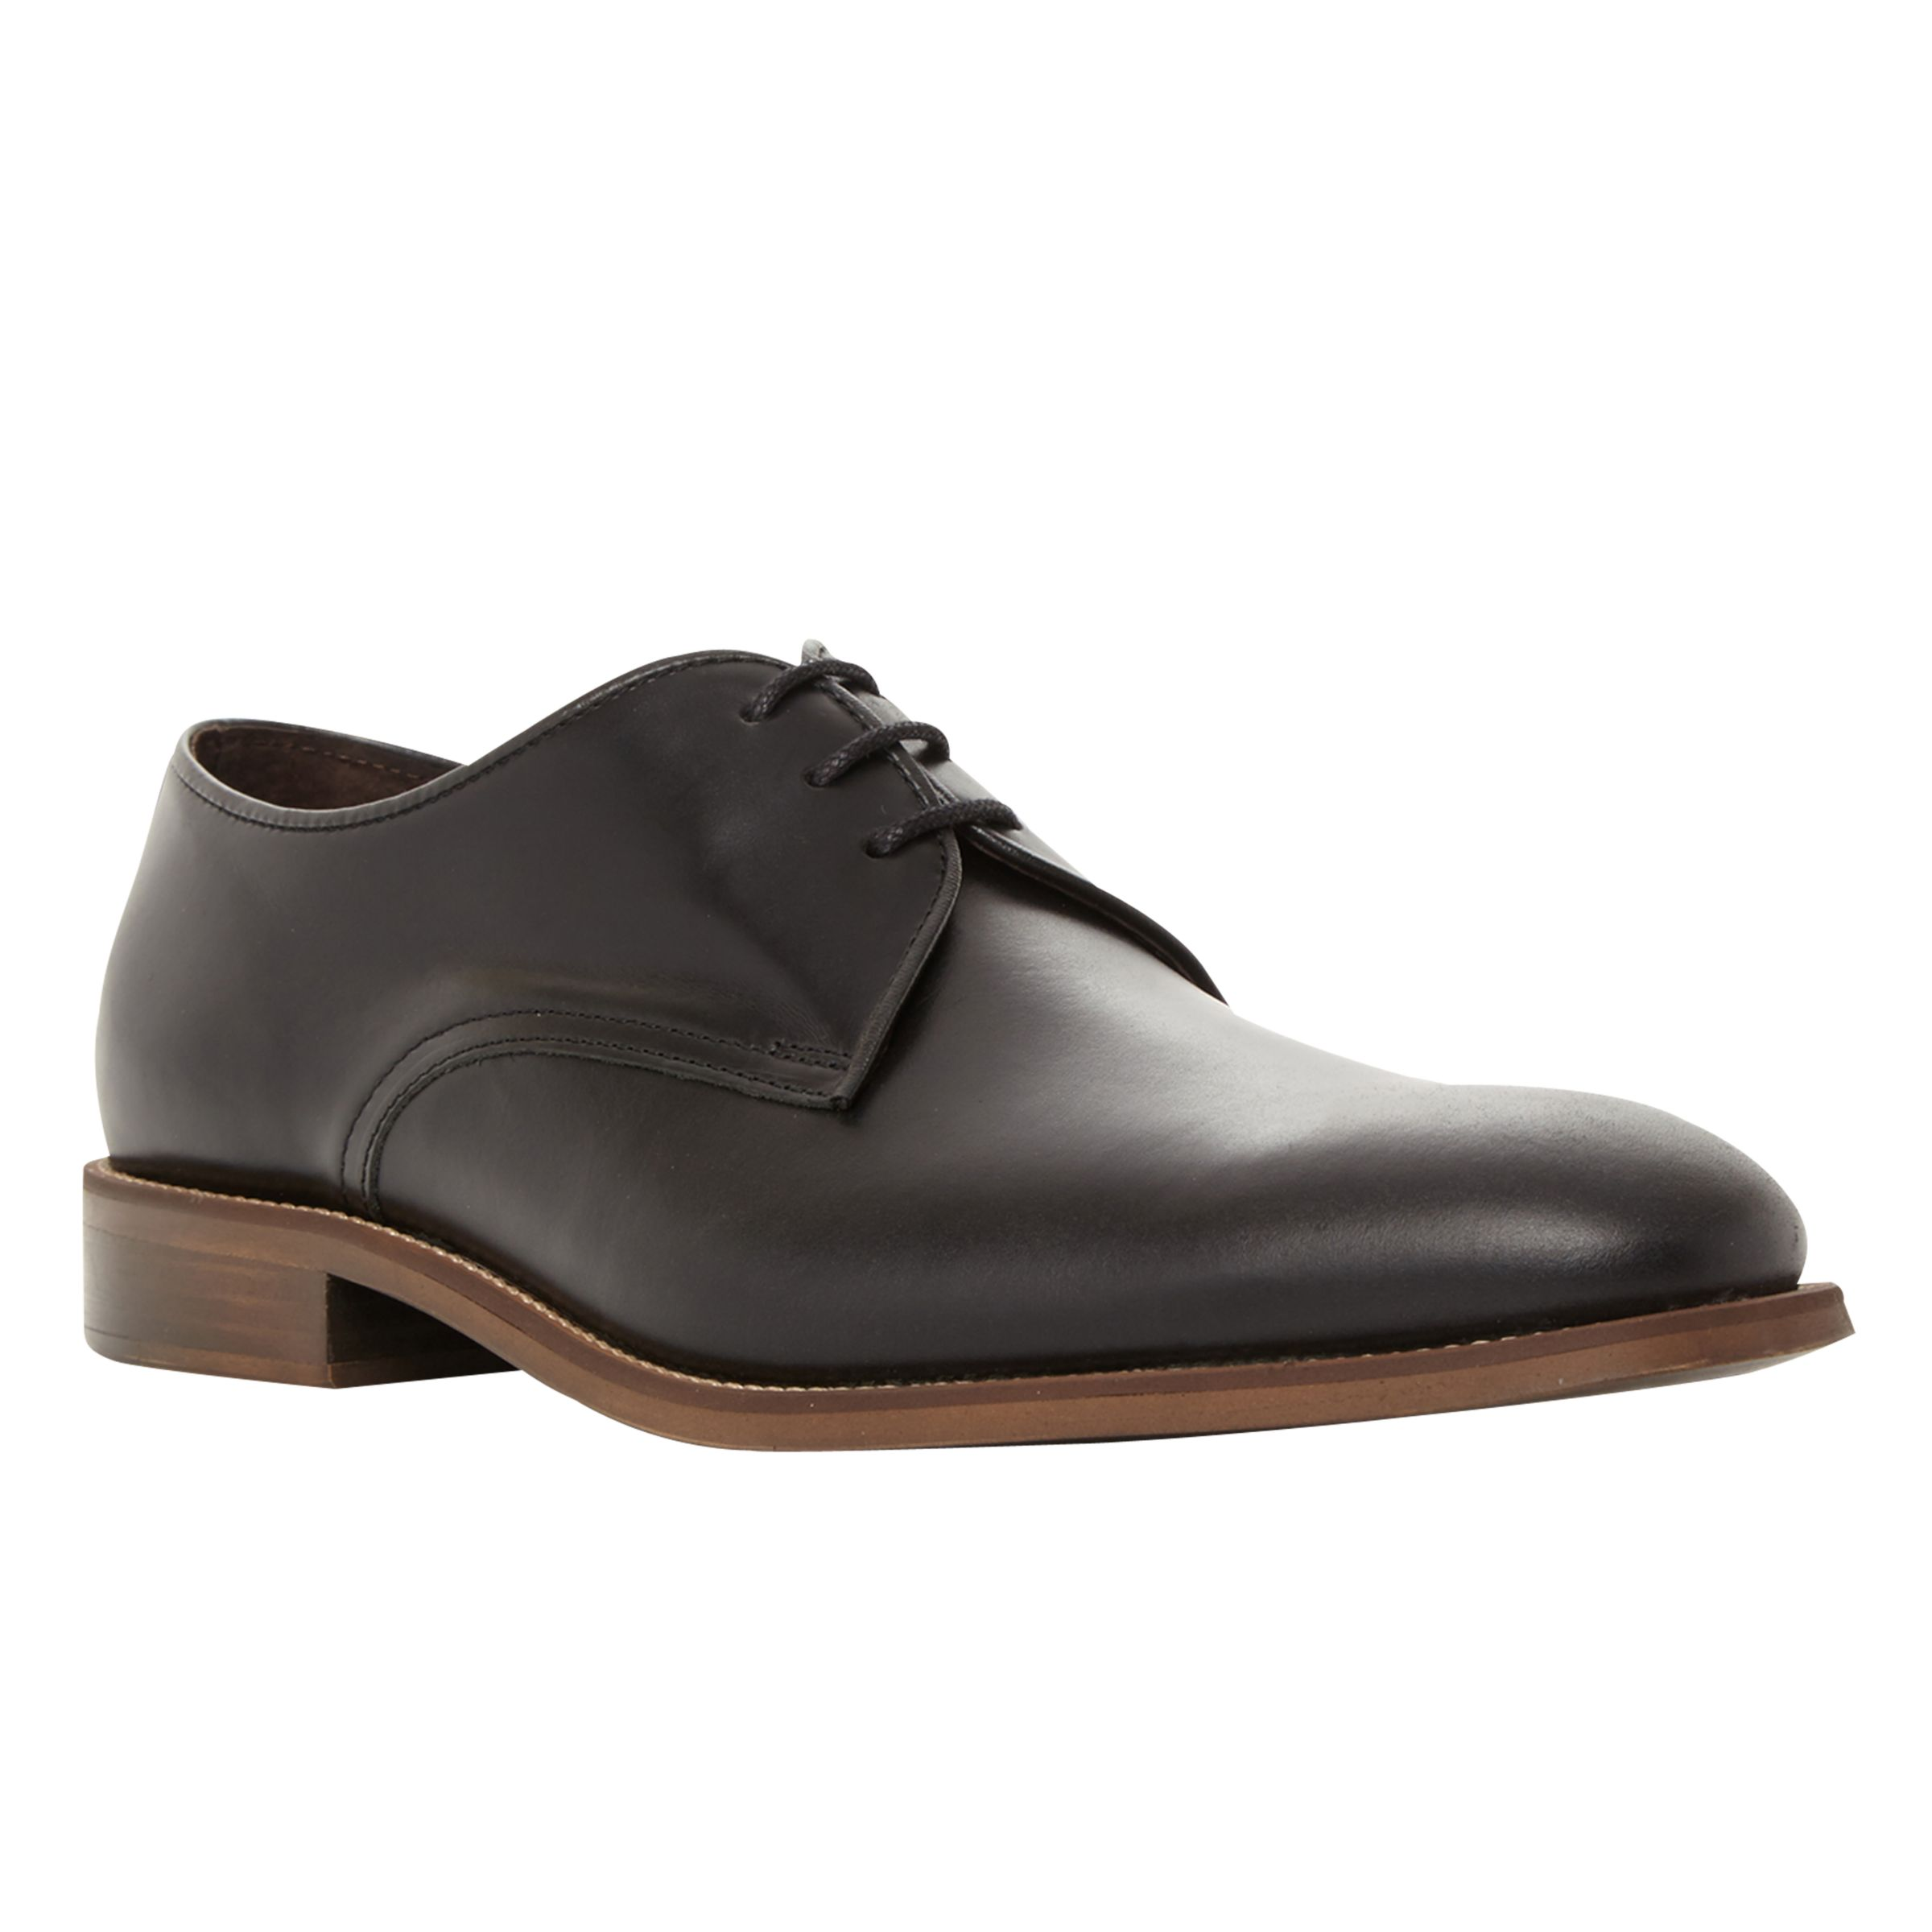 Bertie Bertie Ricon Derby Shoes, Black